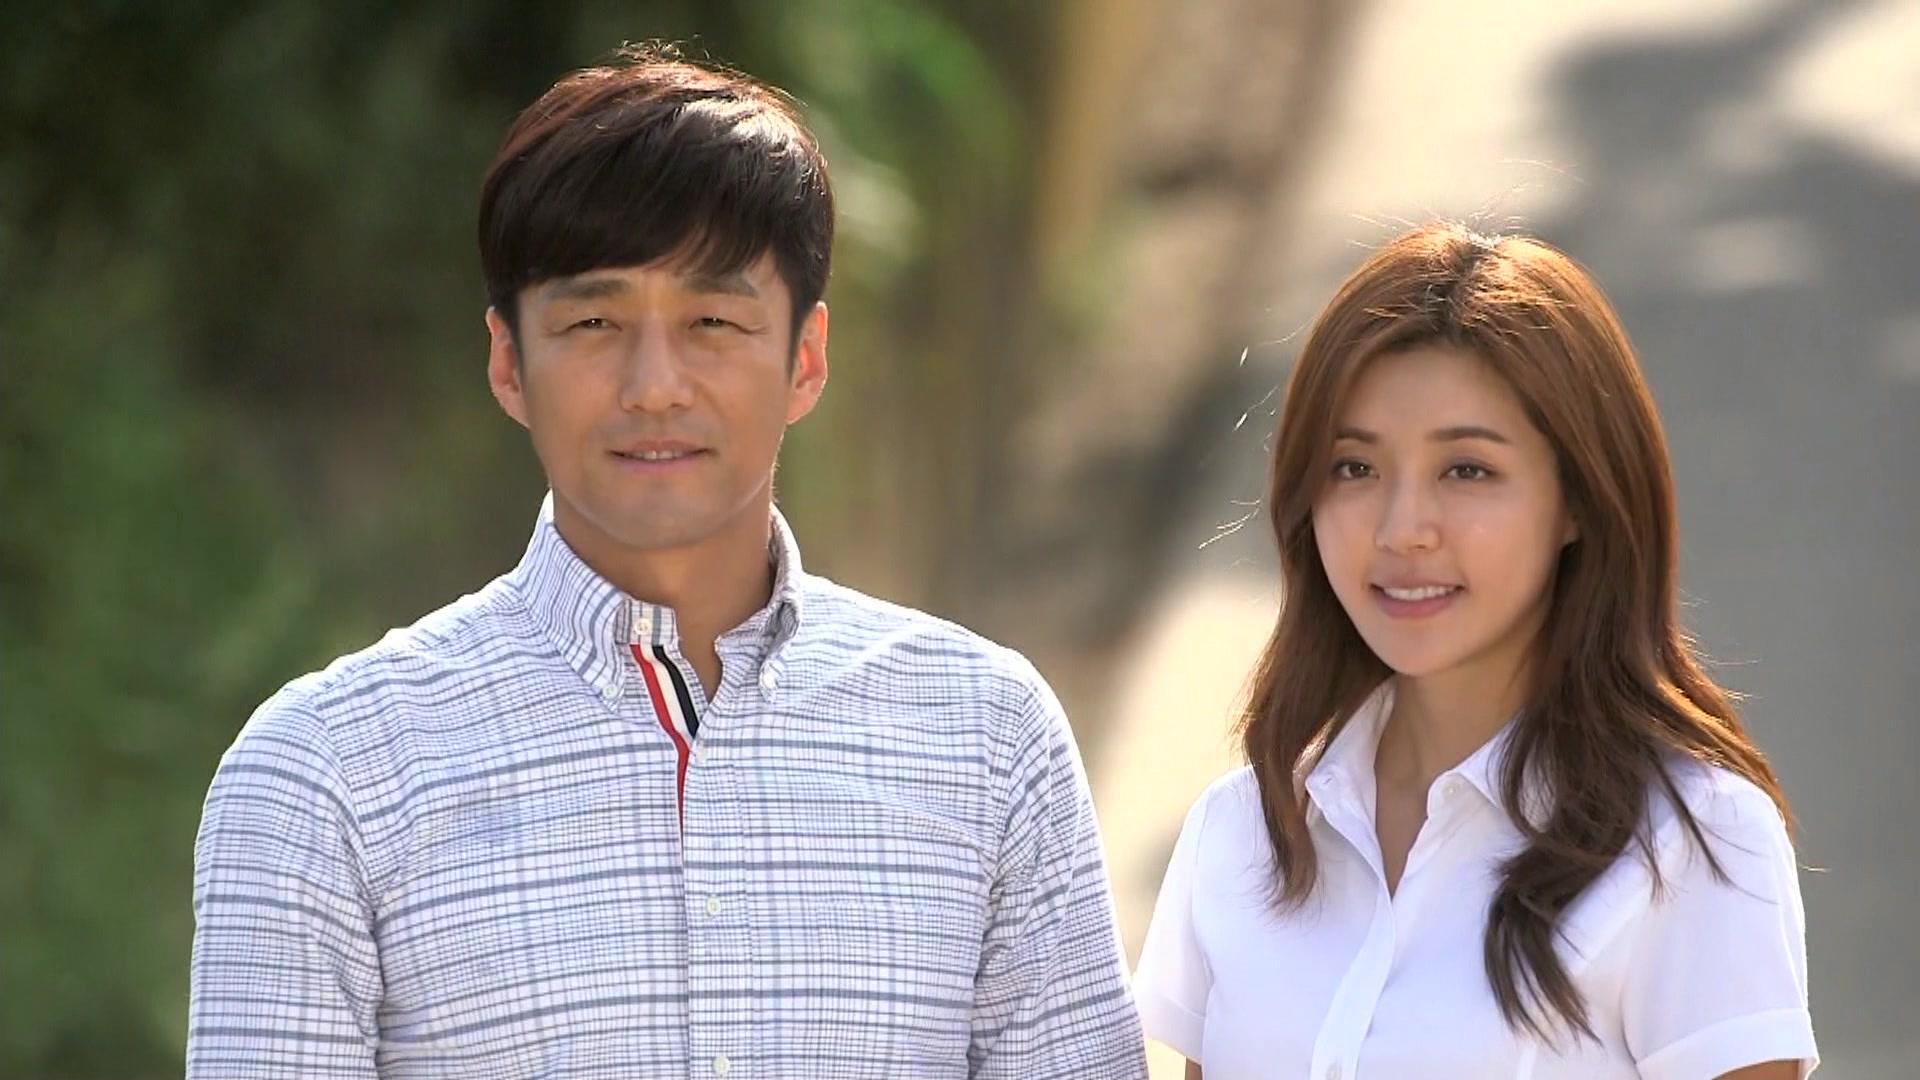 I Have a Lover Episode 29 - 애인있어요 - Watch Full Episodes Free - Korea - TV  Shows - Rakuten Viki